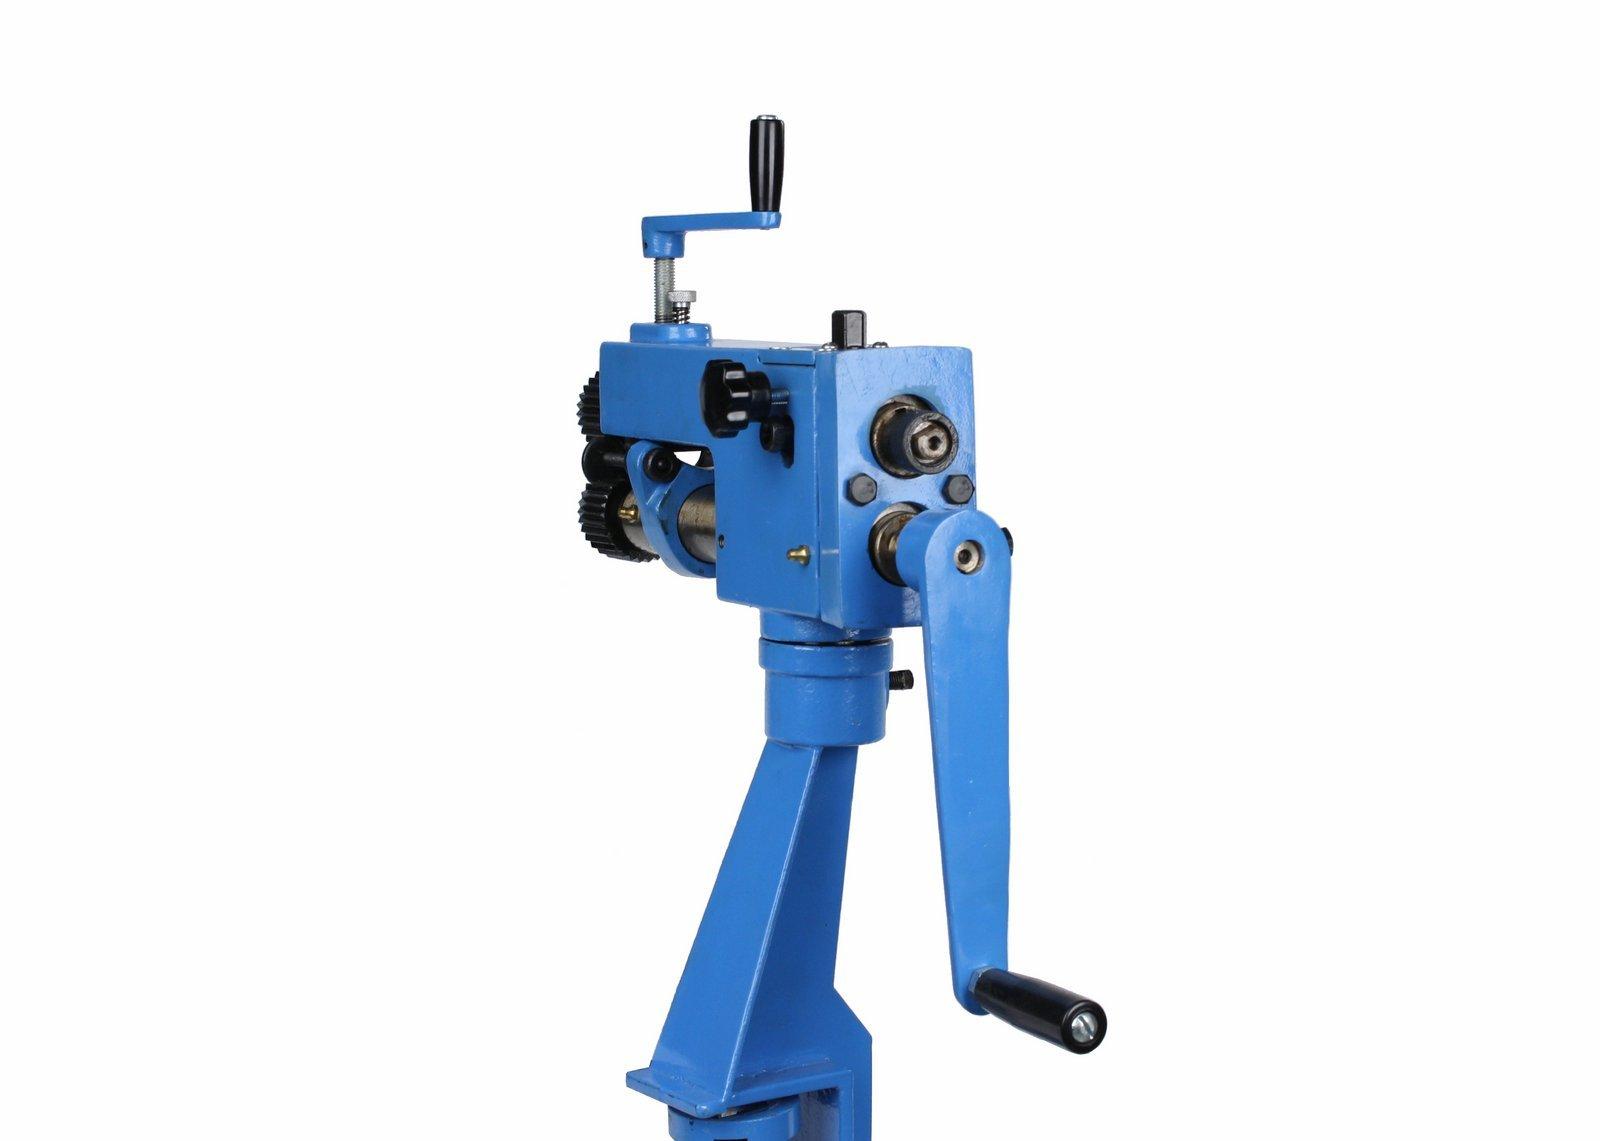 Erie Tools Rotary Machine Bead Roller Sheet Metal Forming /& Steel Bender HVAC Fabrication with 22 Gauge Capacity